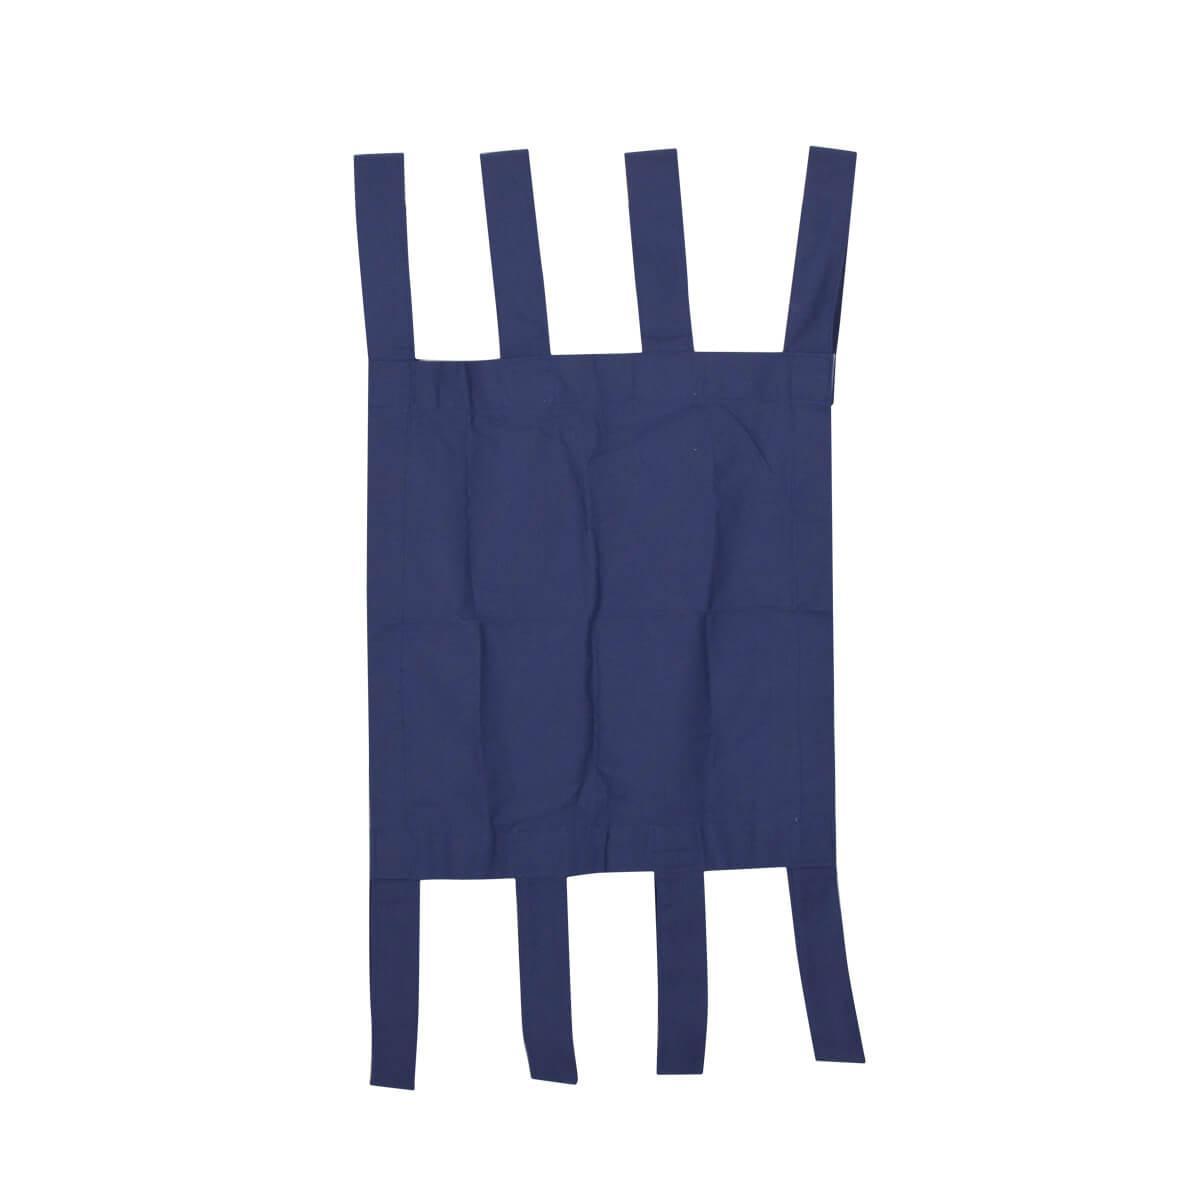 Baldachin klein 106x50cm DESTYLE de Breuyn dunkelblau